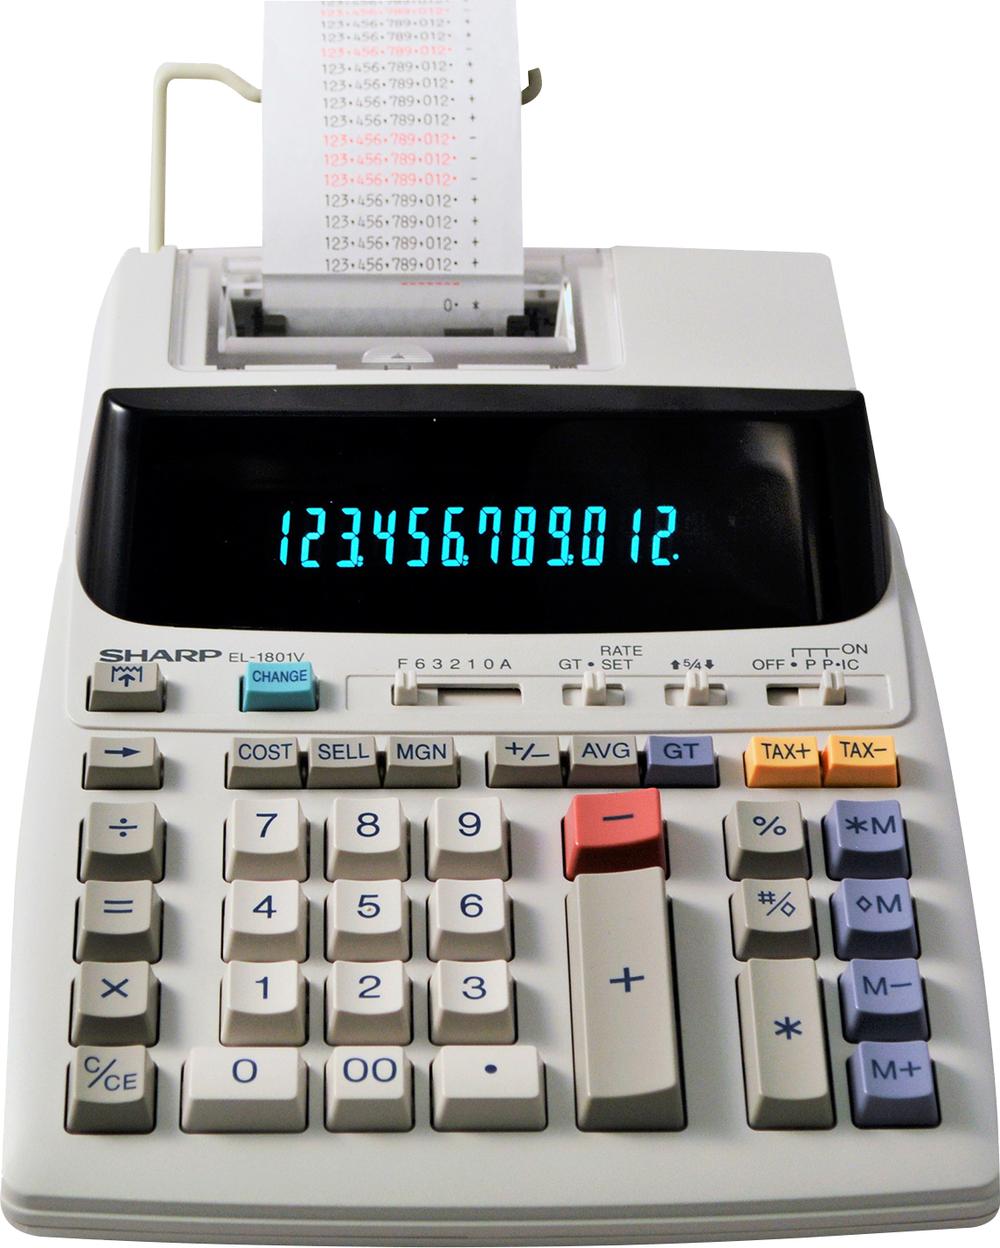 EL-1801V Printing Calculator  White, PACKAGE 1Pk